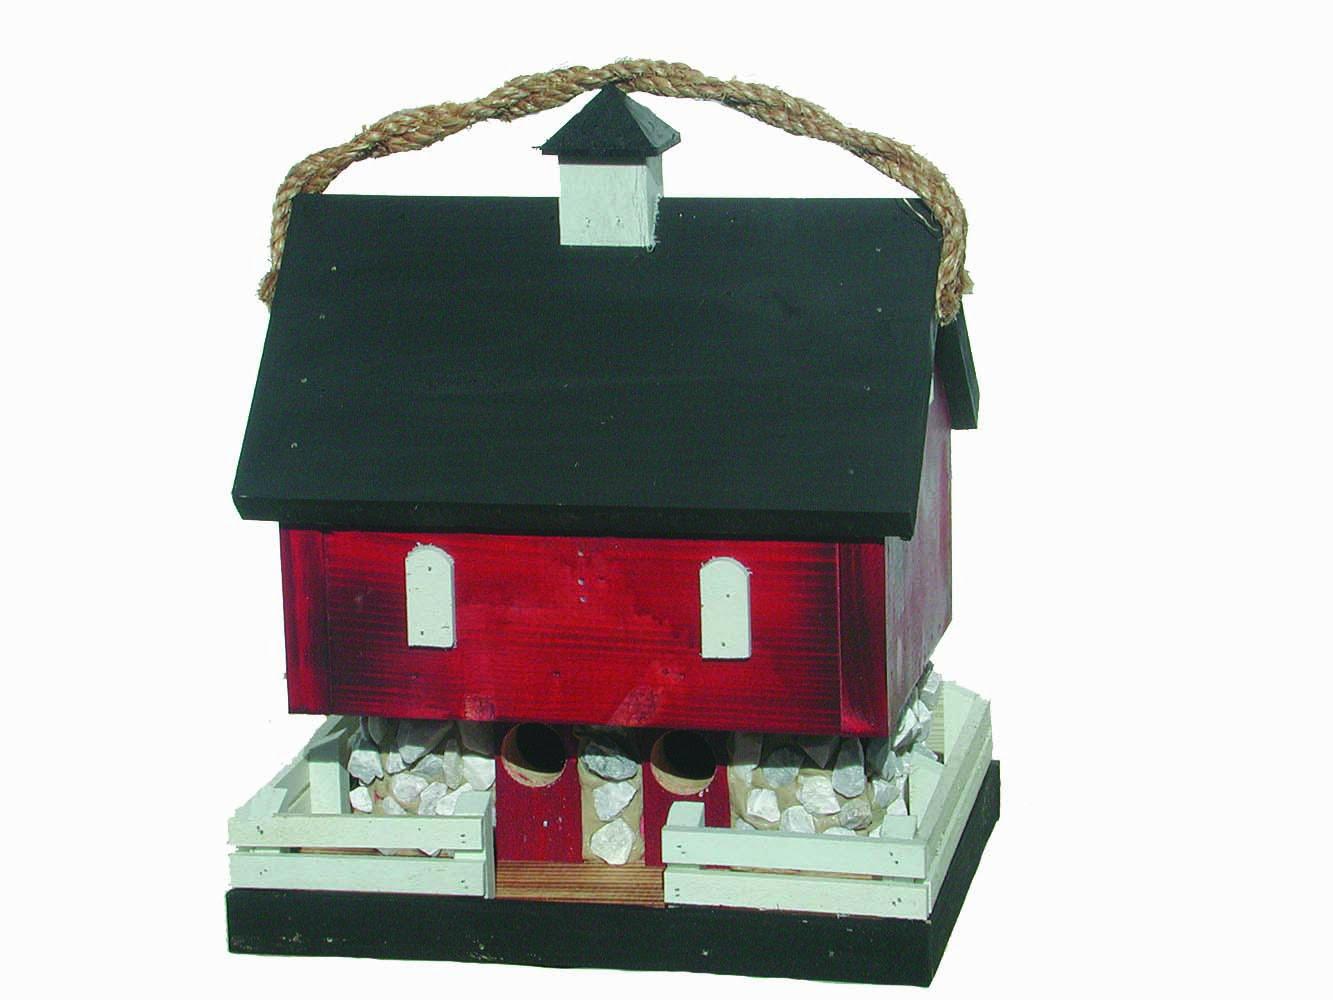 RBBH Red Barn Birdhouse